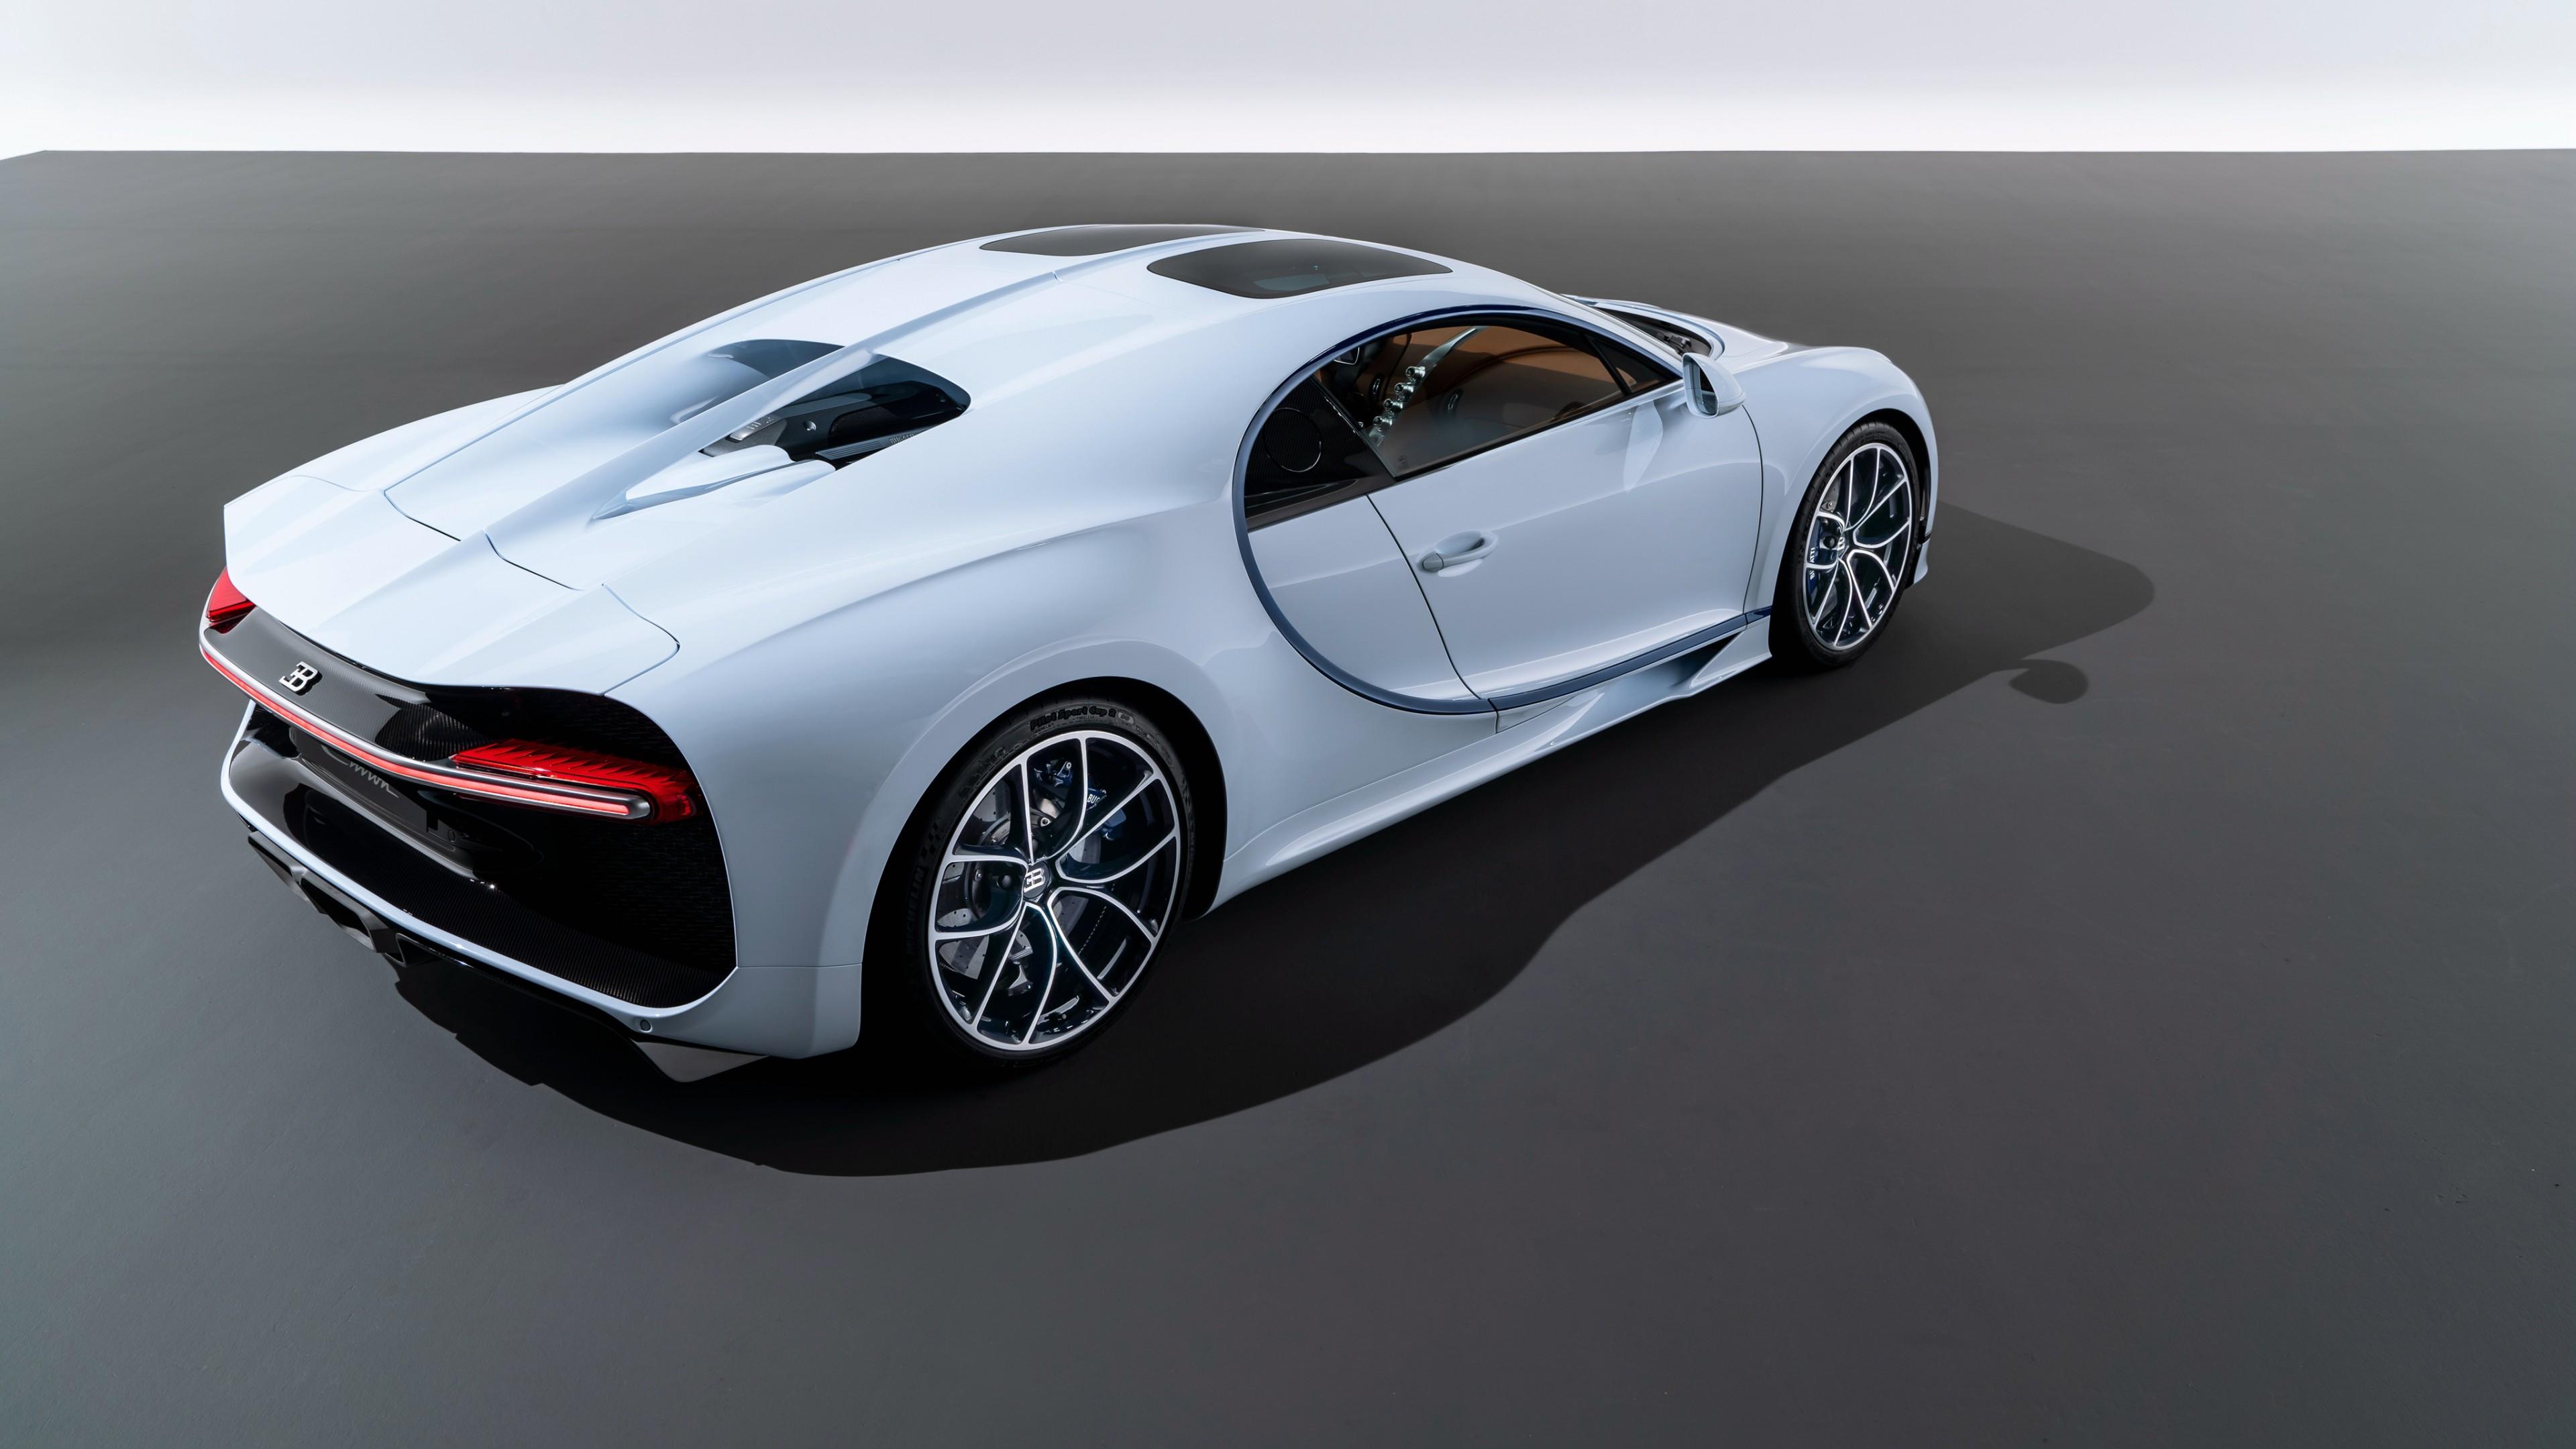 Bugatti Chiron Sky View Show Car 4K 3 Wallpaper HD Car